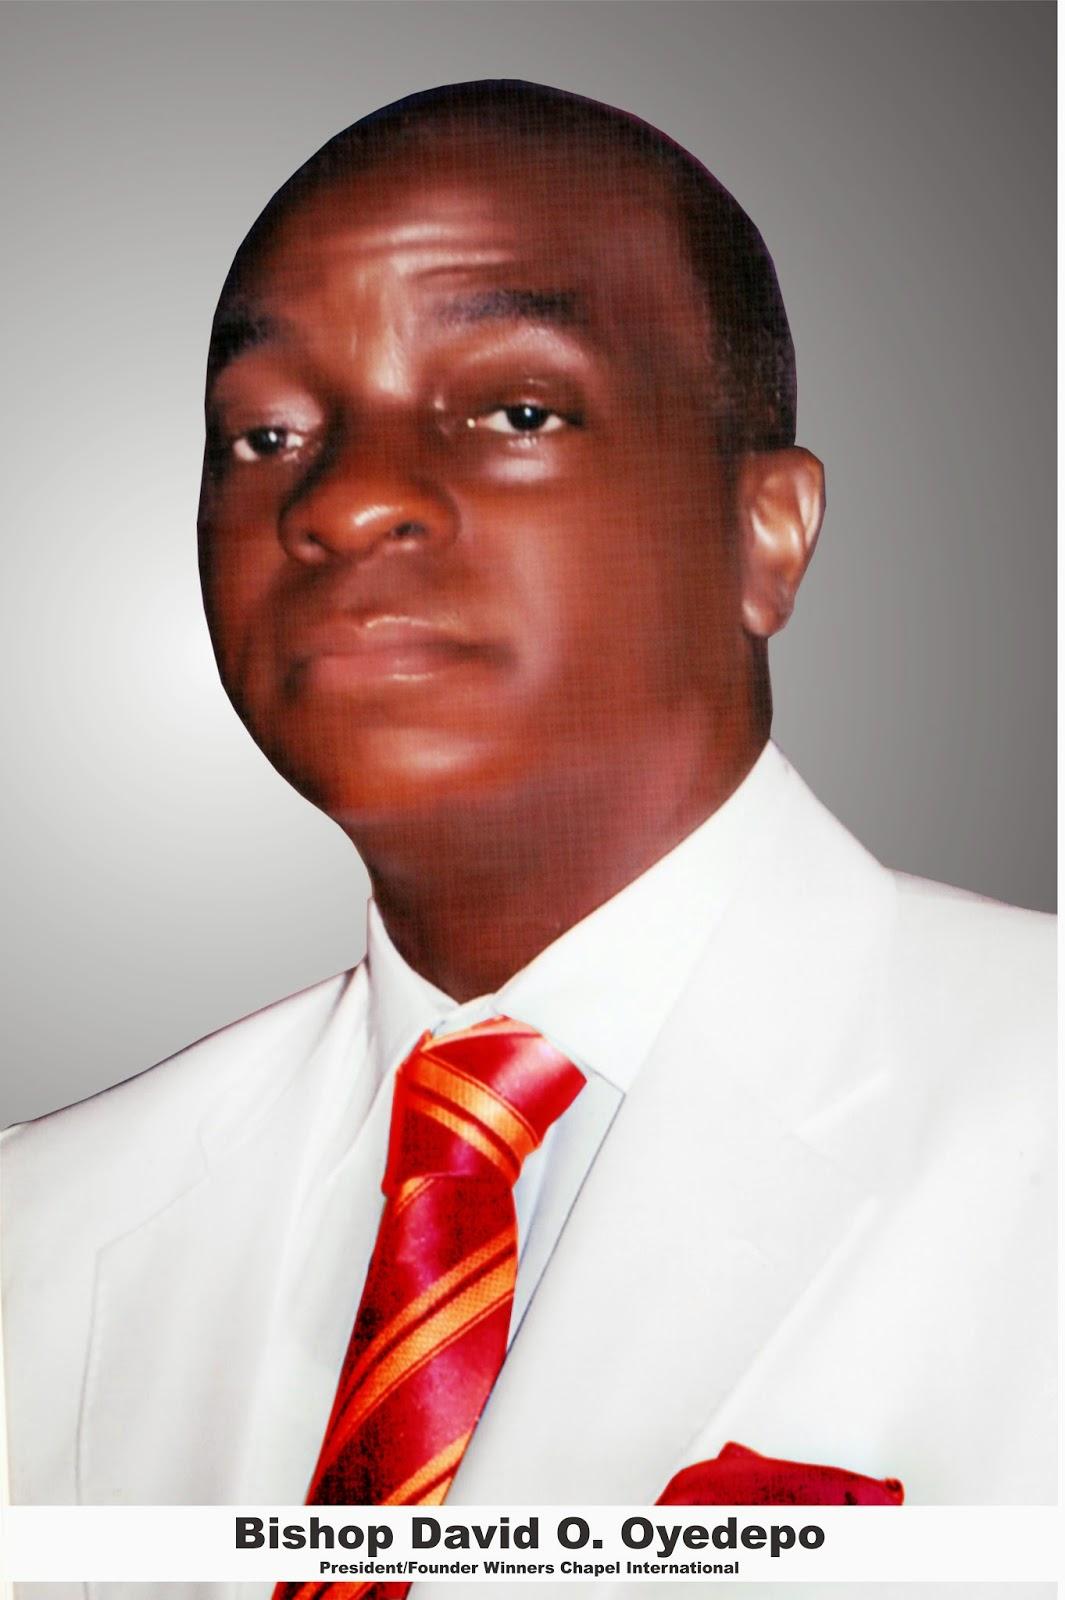 Bishop david oyedepo sermons download free priorityhappy.